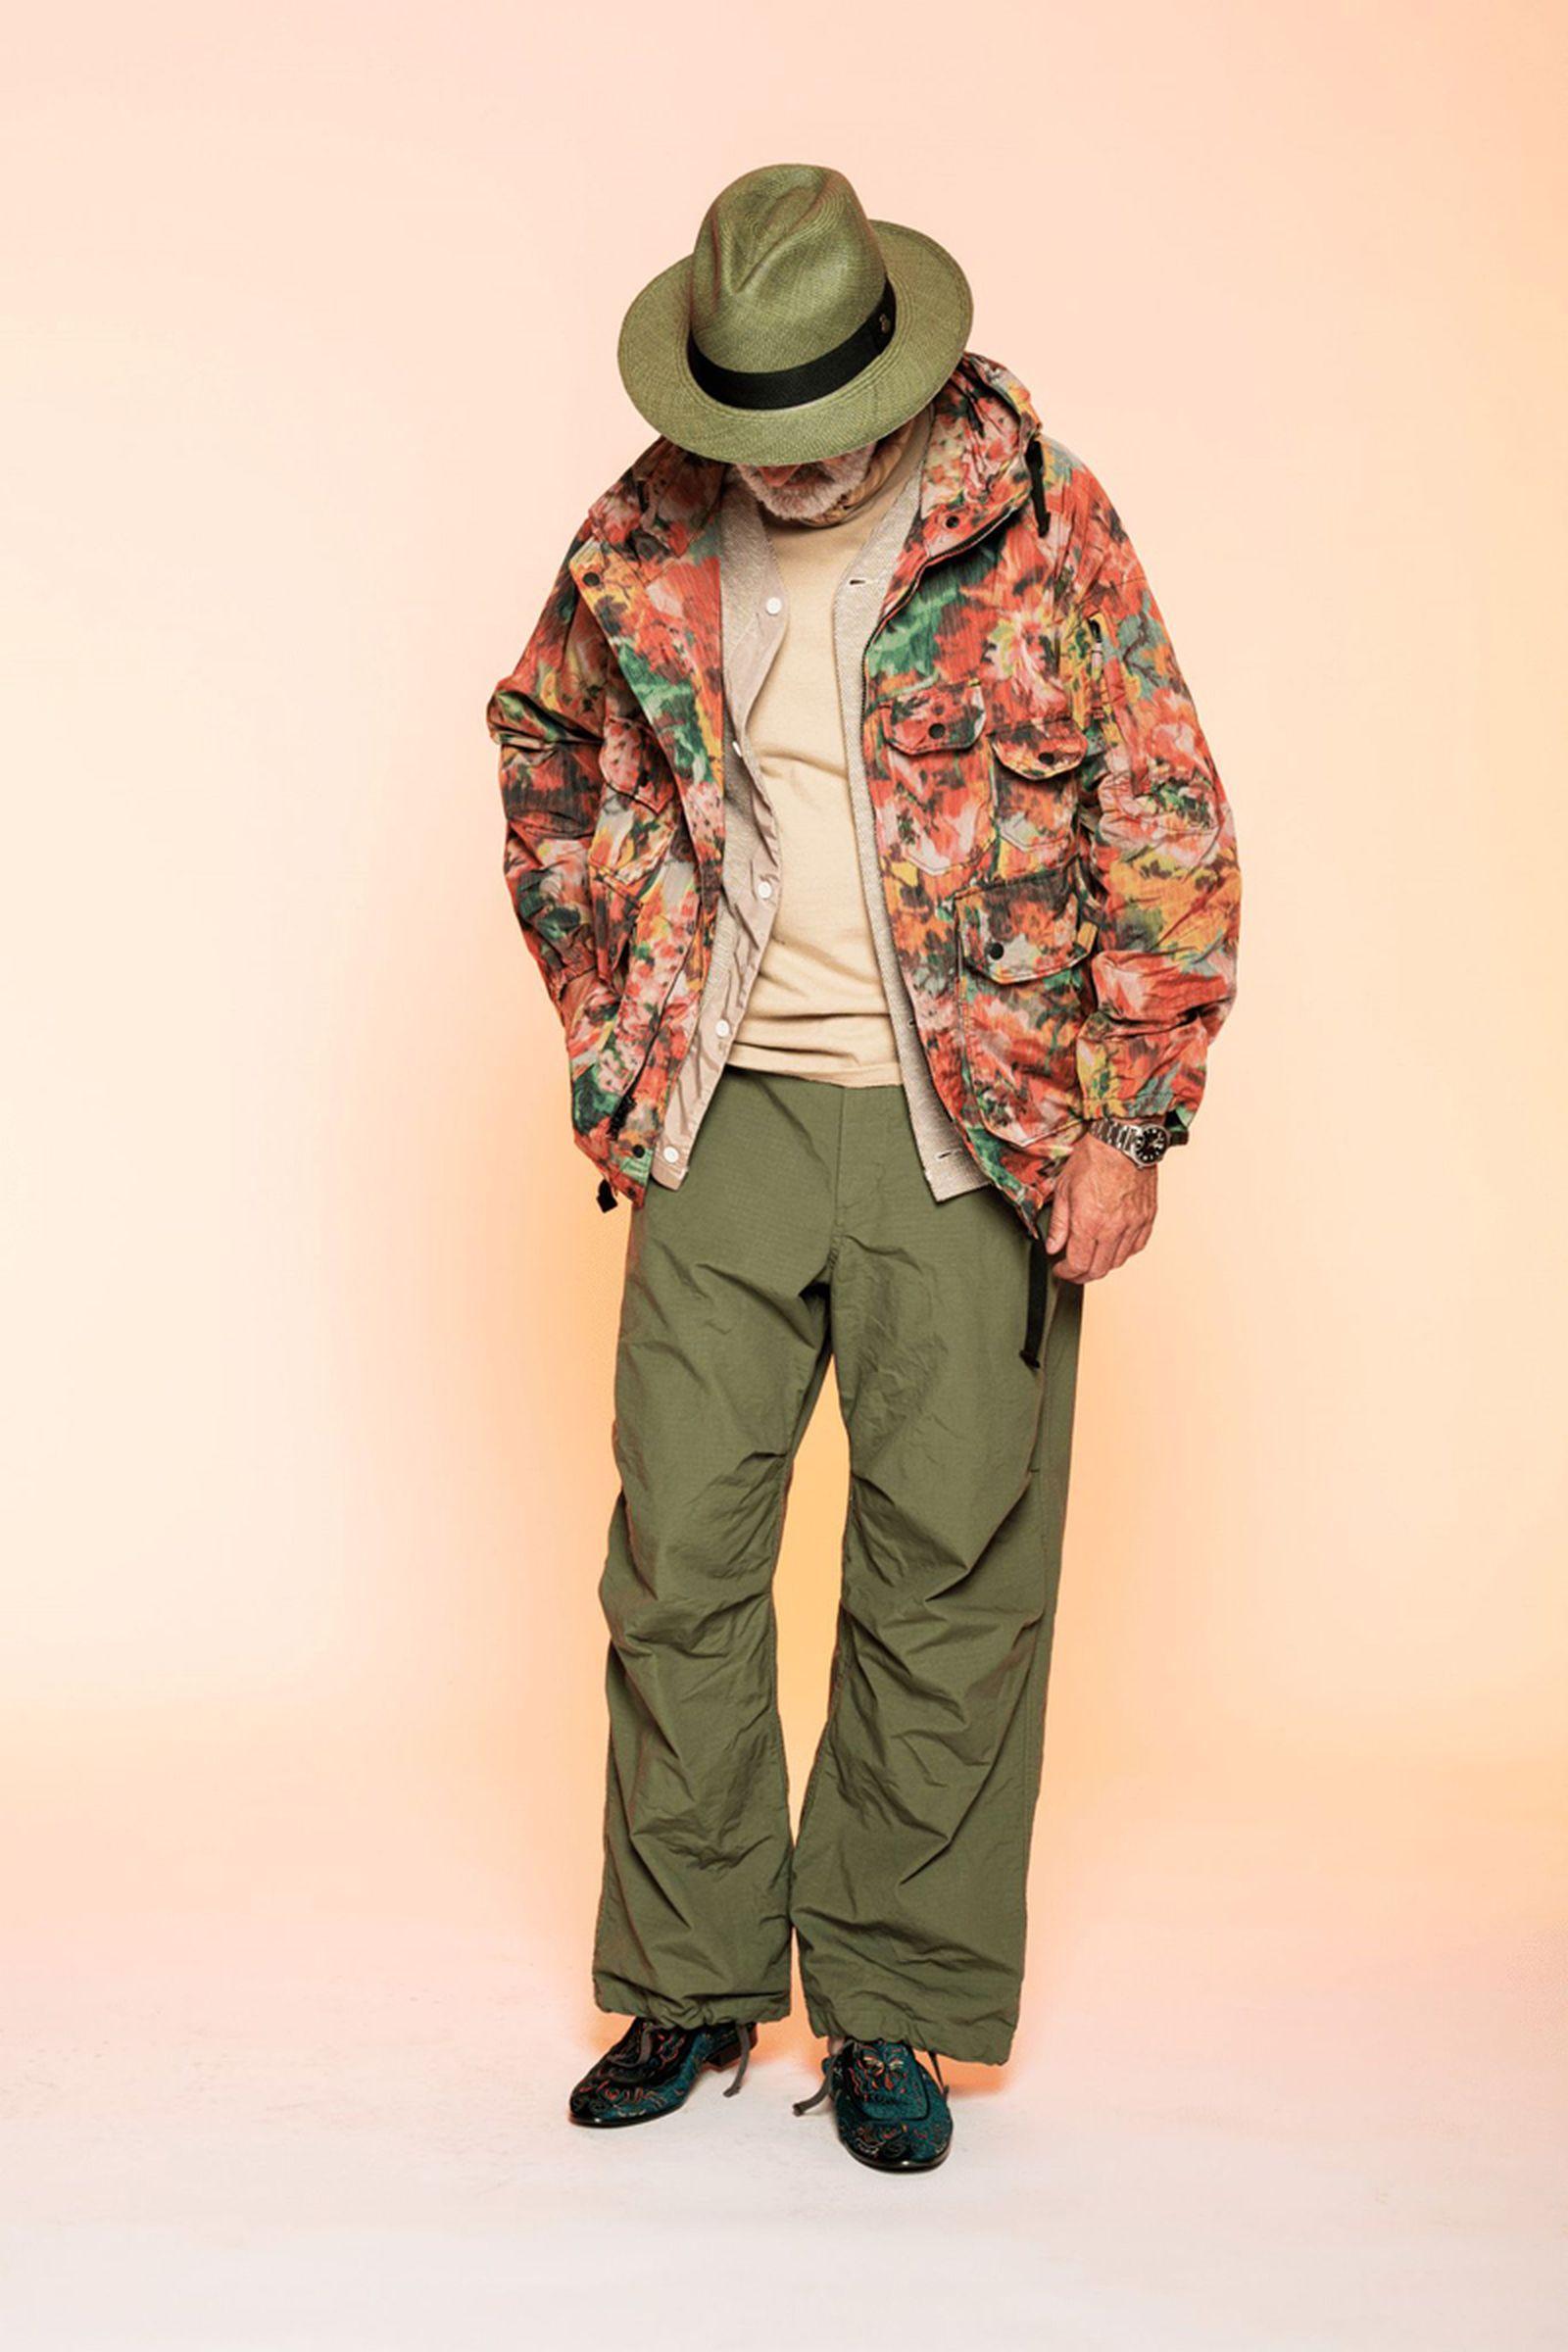 engineered garments spring summer 2022 collection lookbook (8)